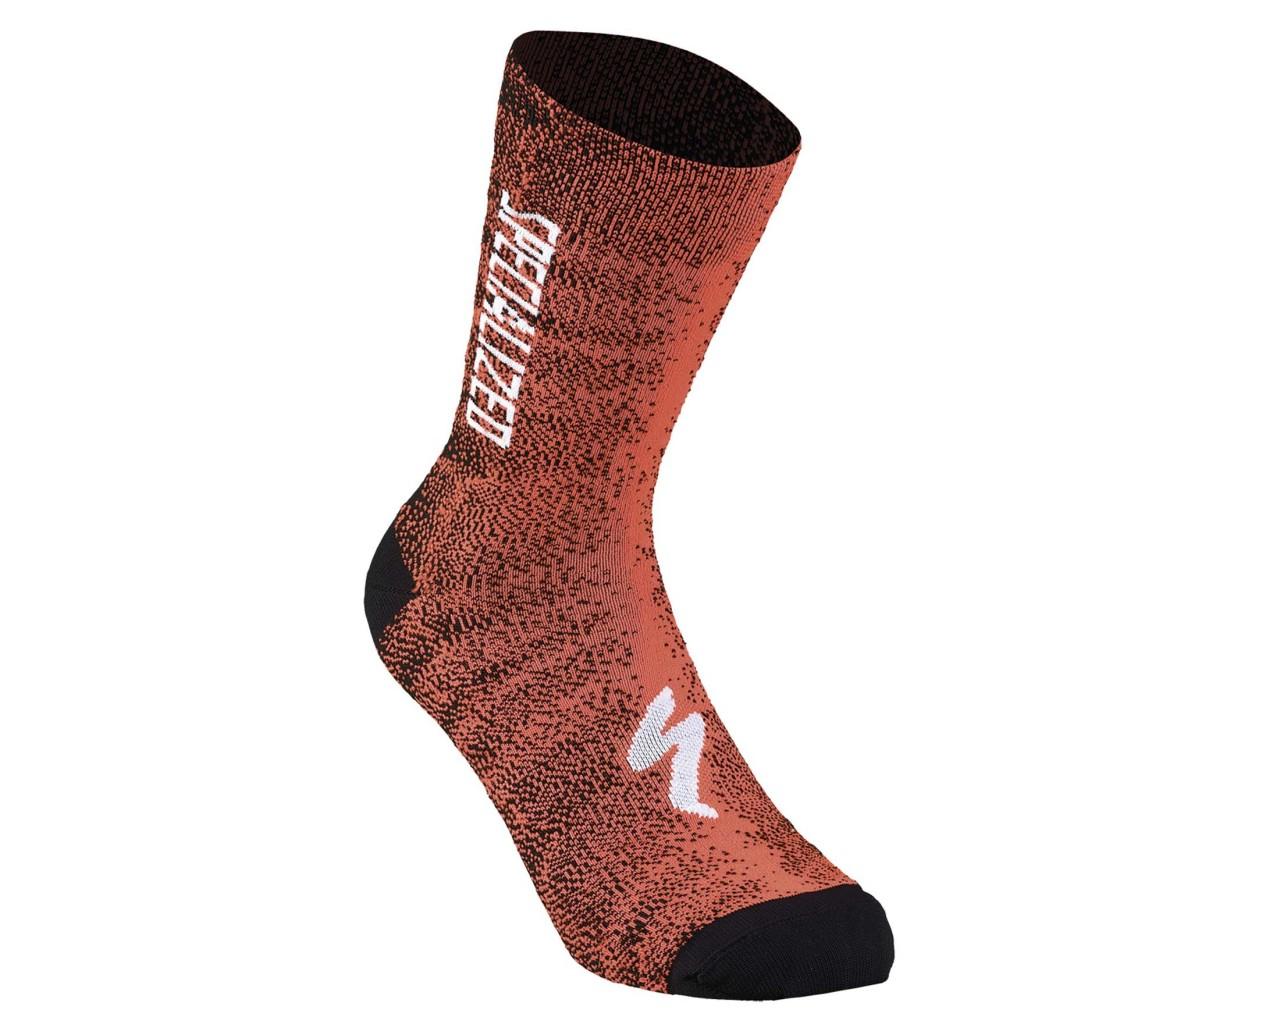 Specialized SL Team Expert Socks   rocket red-black faze